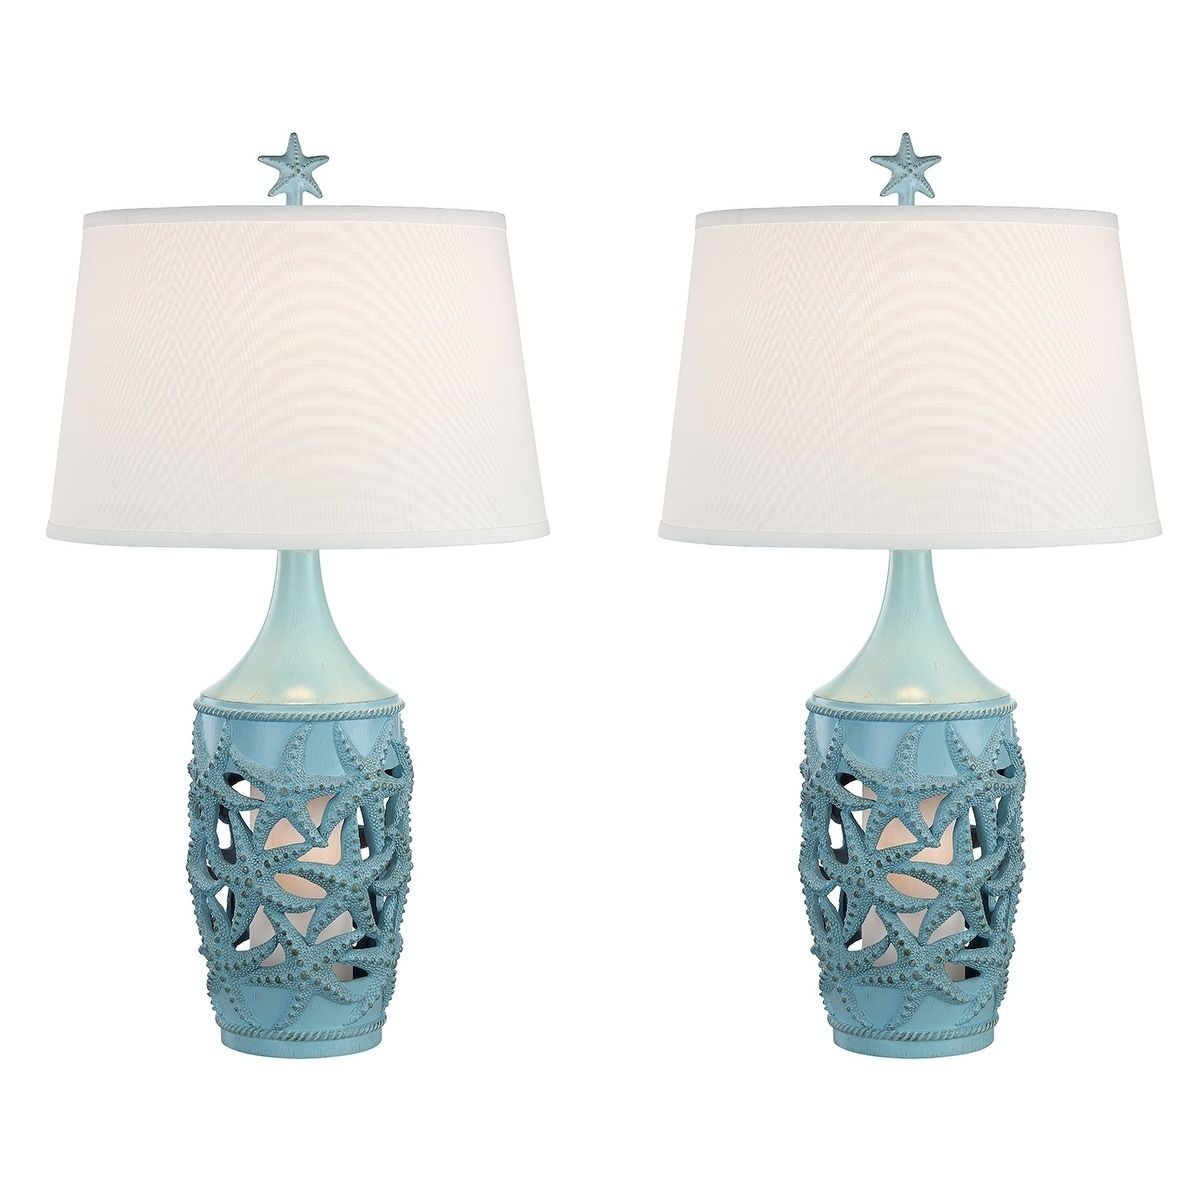 Seahaven Starfish Coastal Table Lamp Glacier Blue Table Lamp